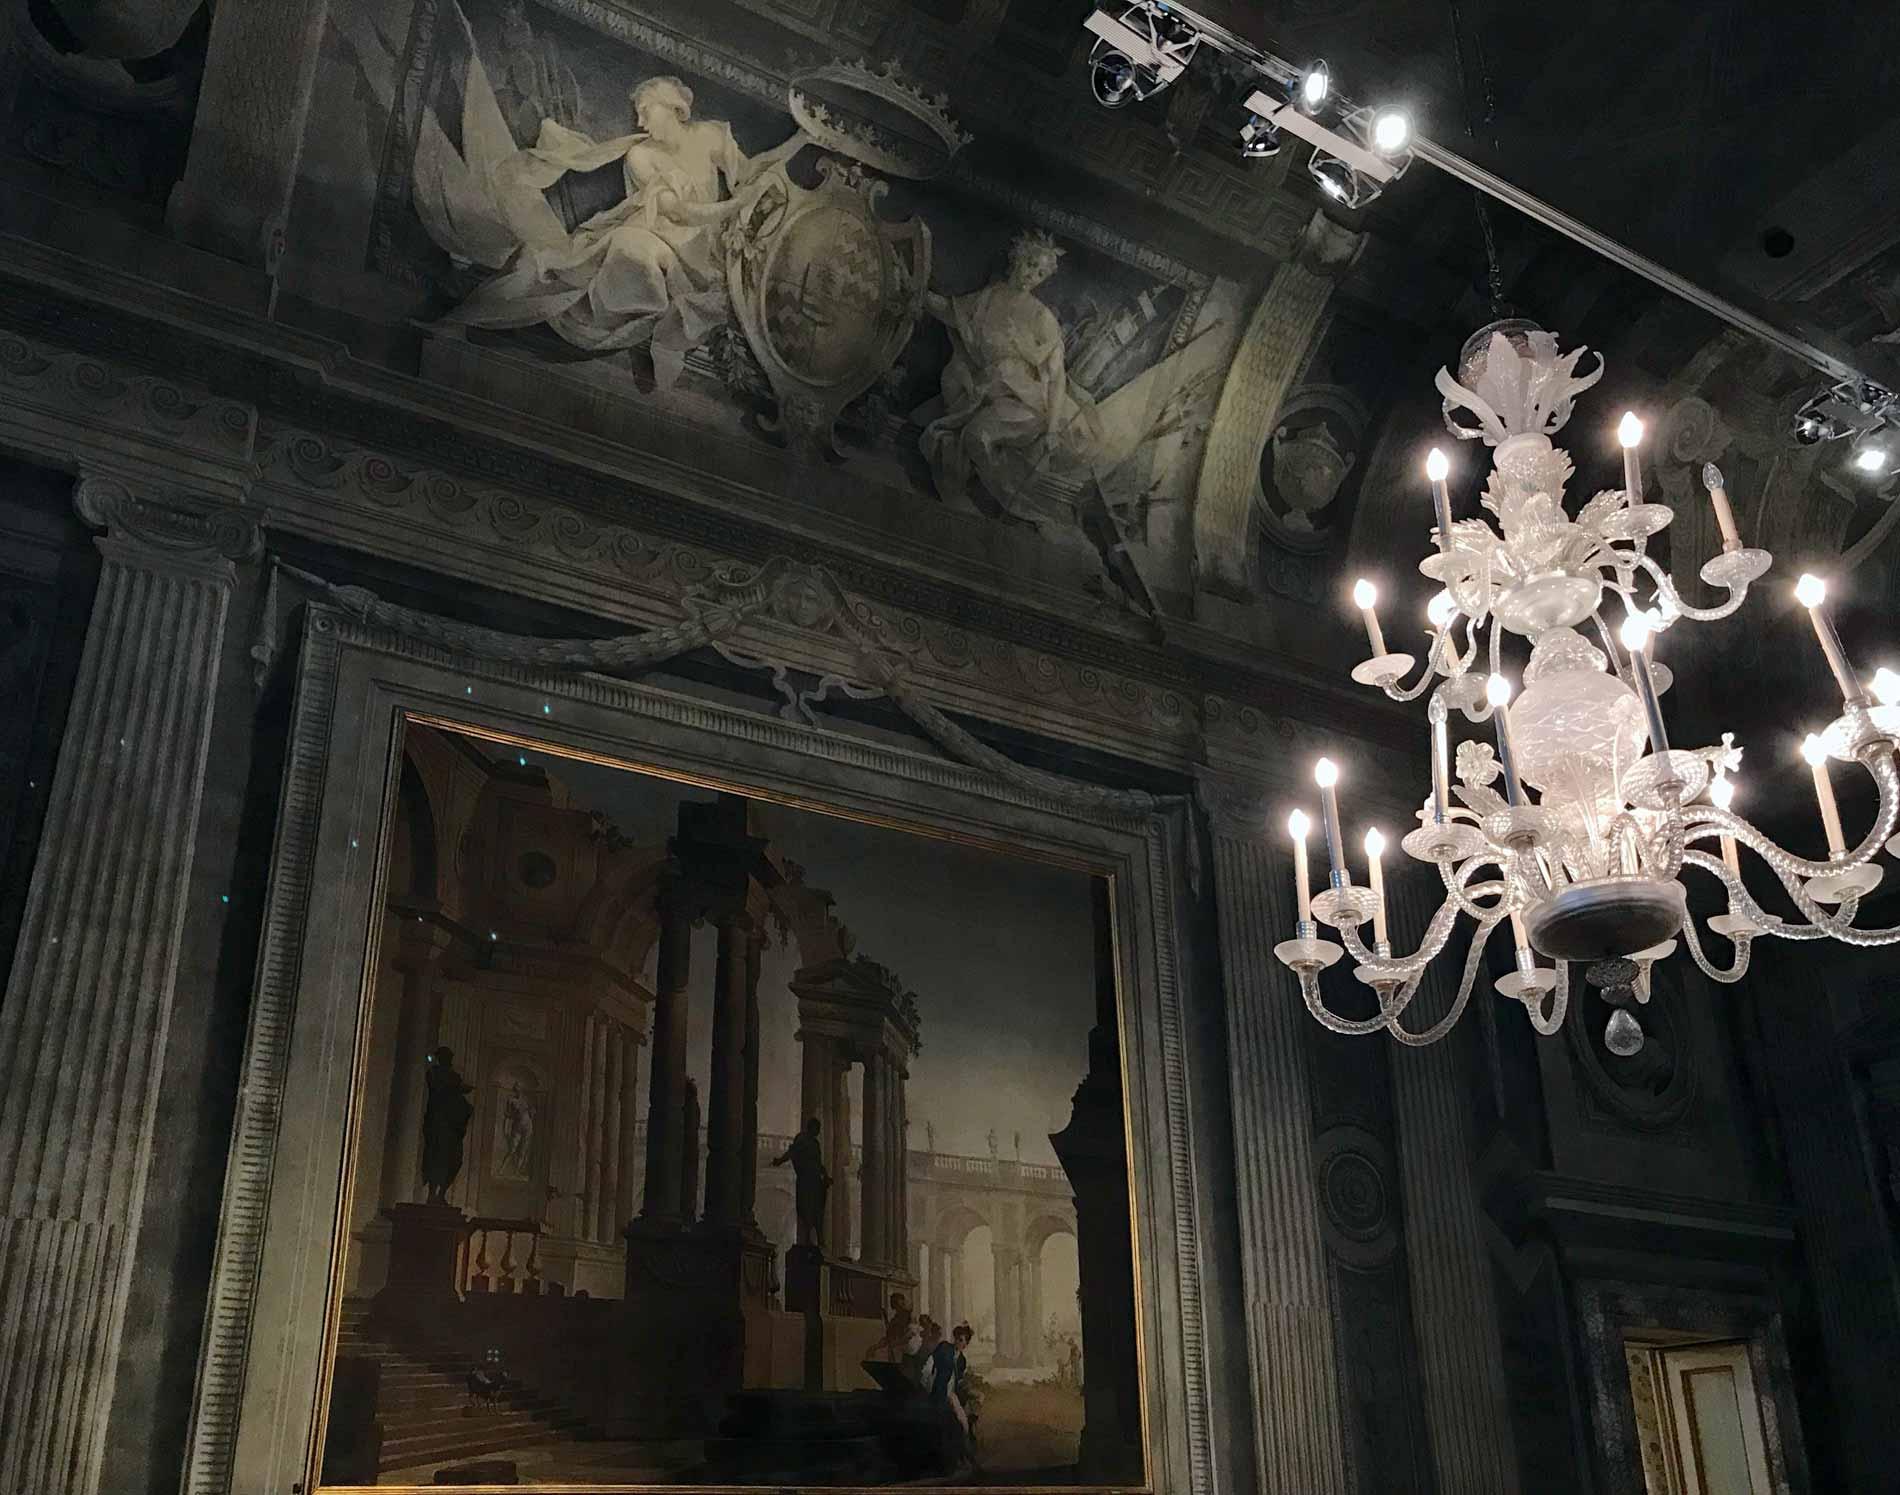 Museo-civico-ala-ponzone-cremona-affreschi-lampadario-luce-soffusa